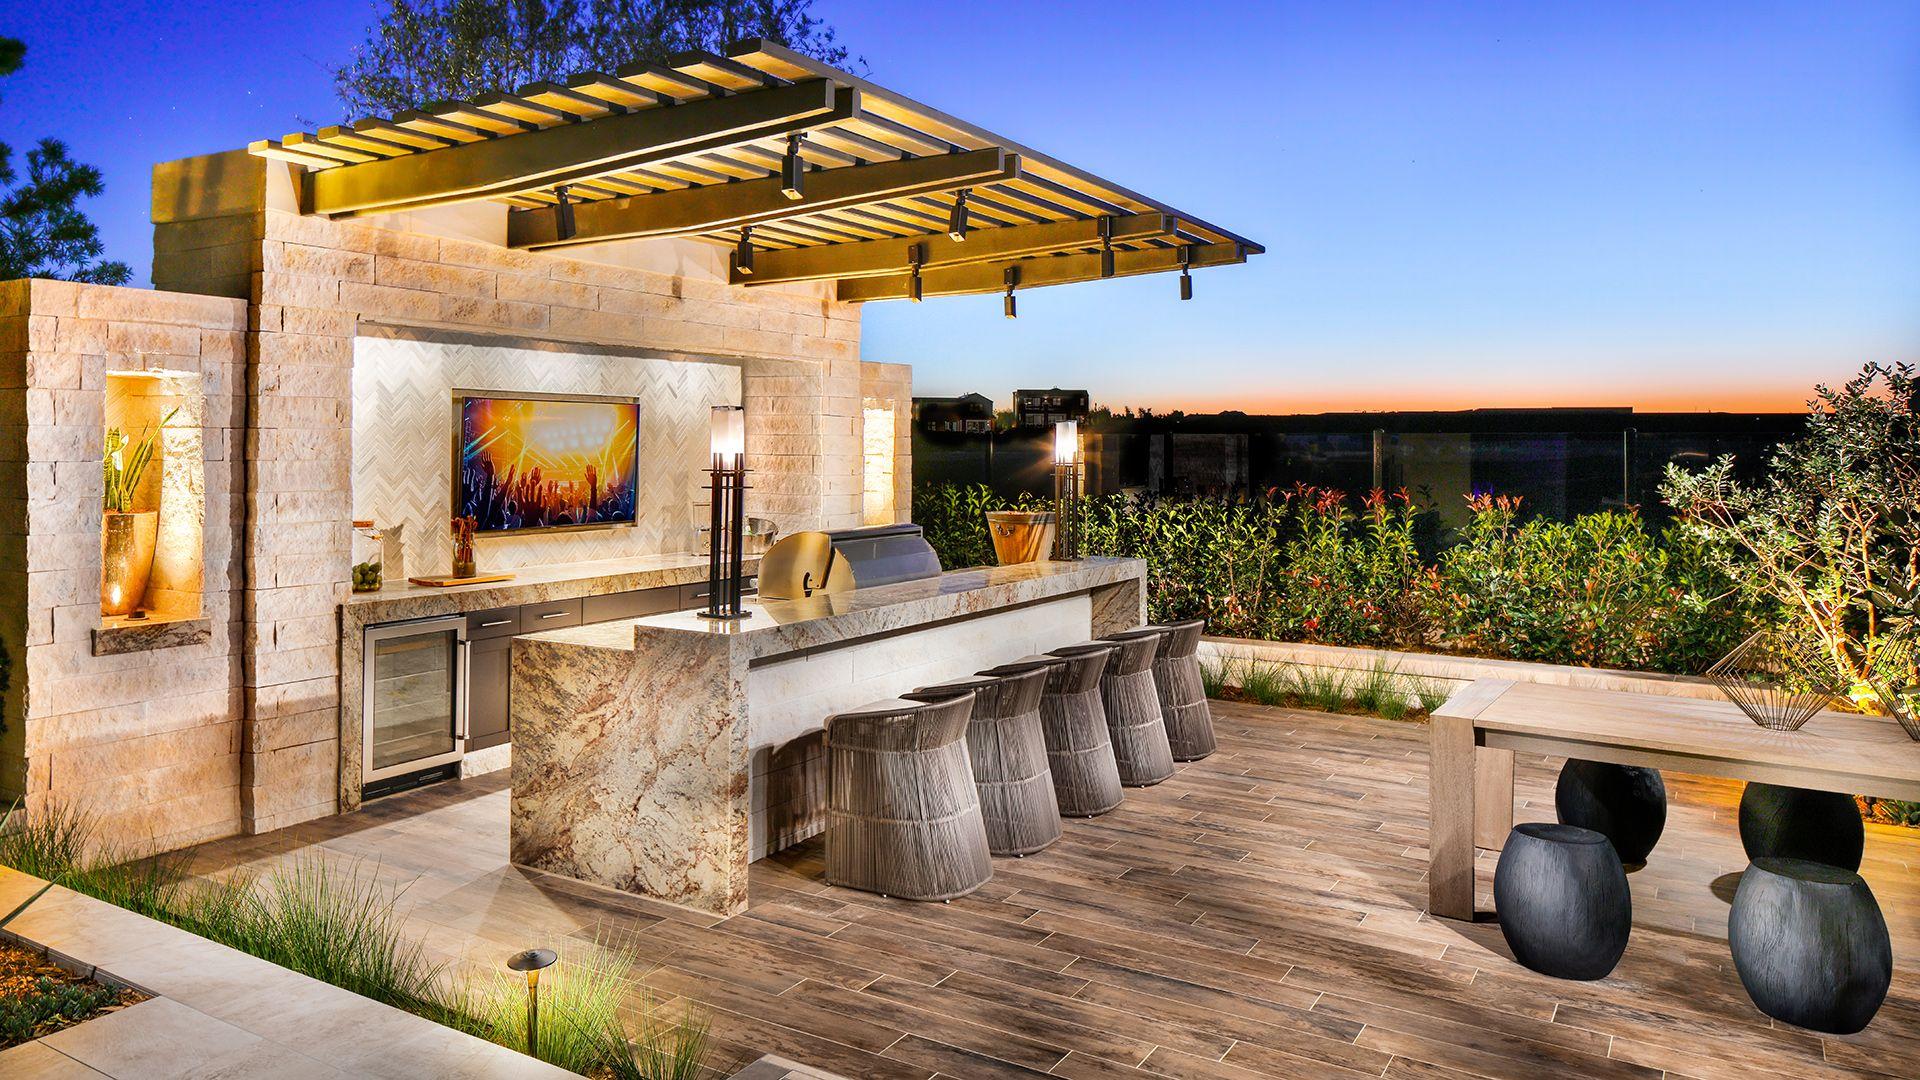 Palomar At Pacific Highlands Ranch Quick Delivery Home Castella Coastal Contemporary Backyard Bar Luxurious Backyard Backyard